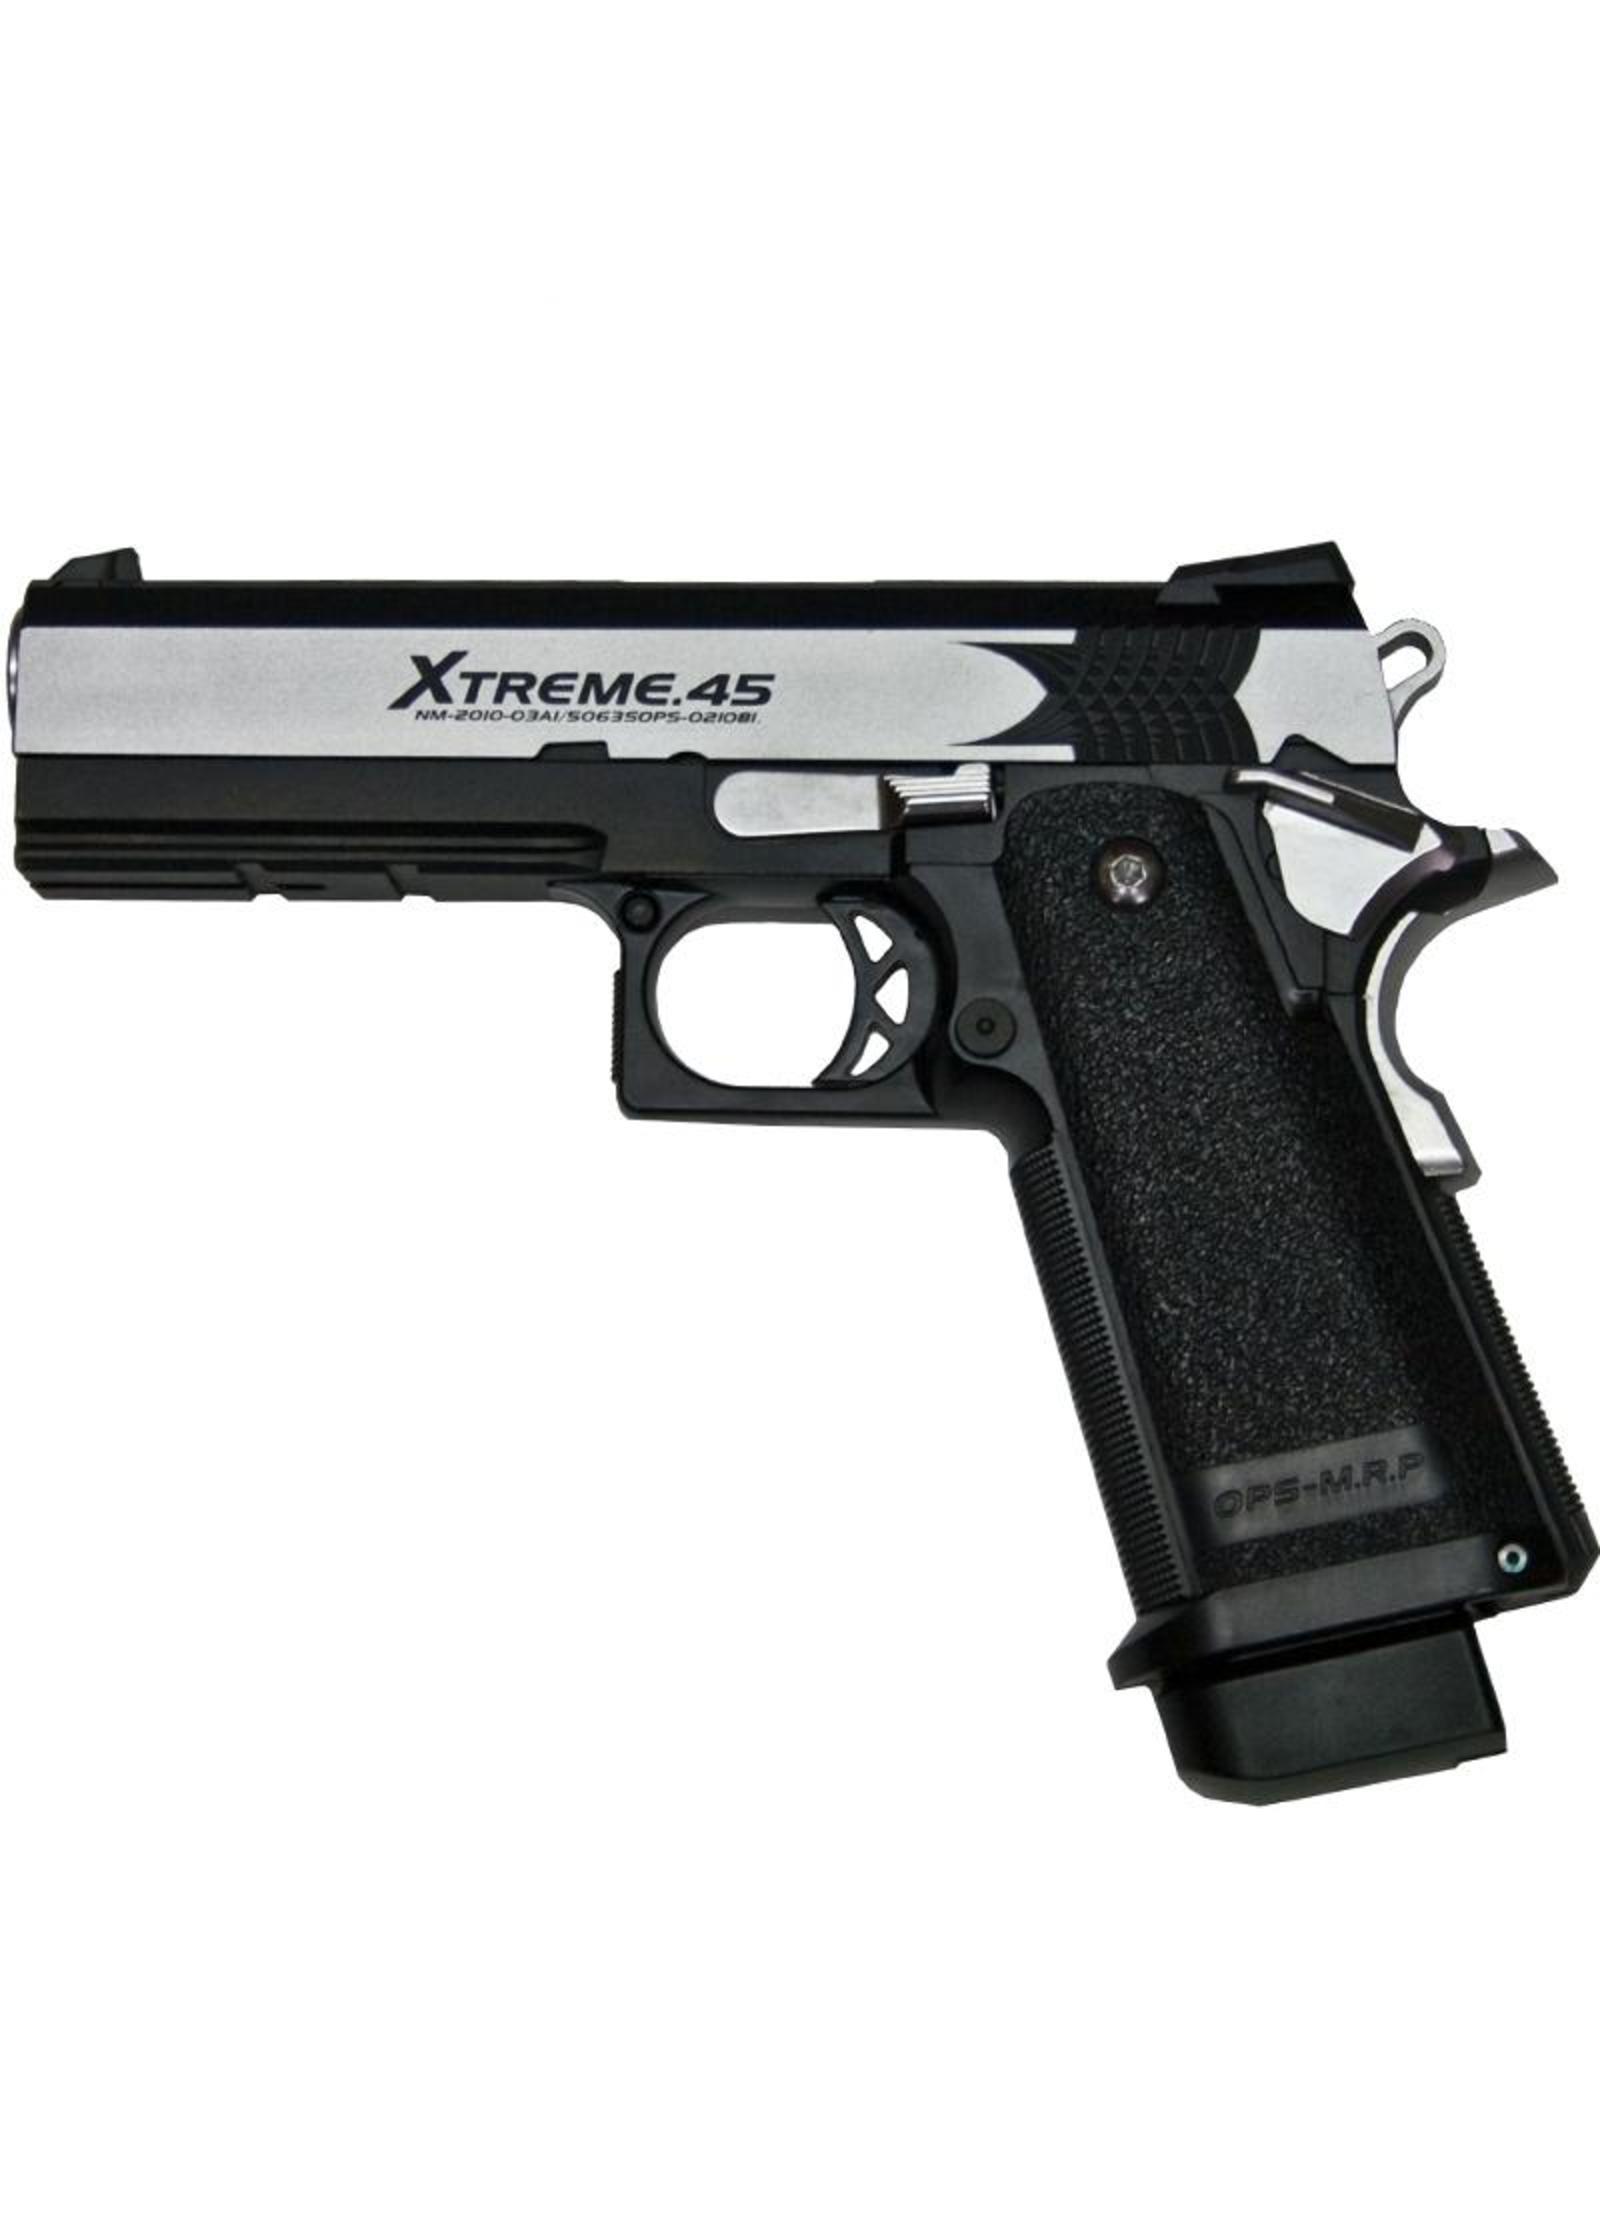 Tokyo Marui - XTreme .45 GBB Full Auto Pistol - Silver